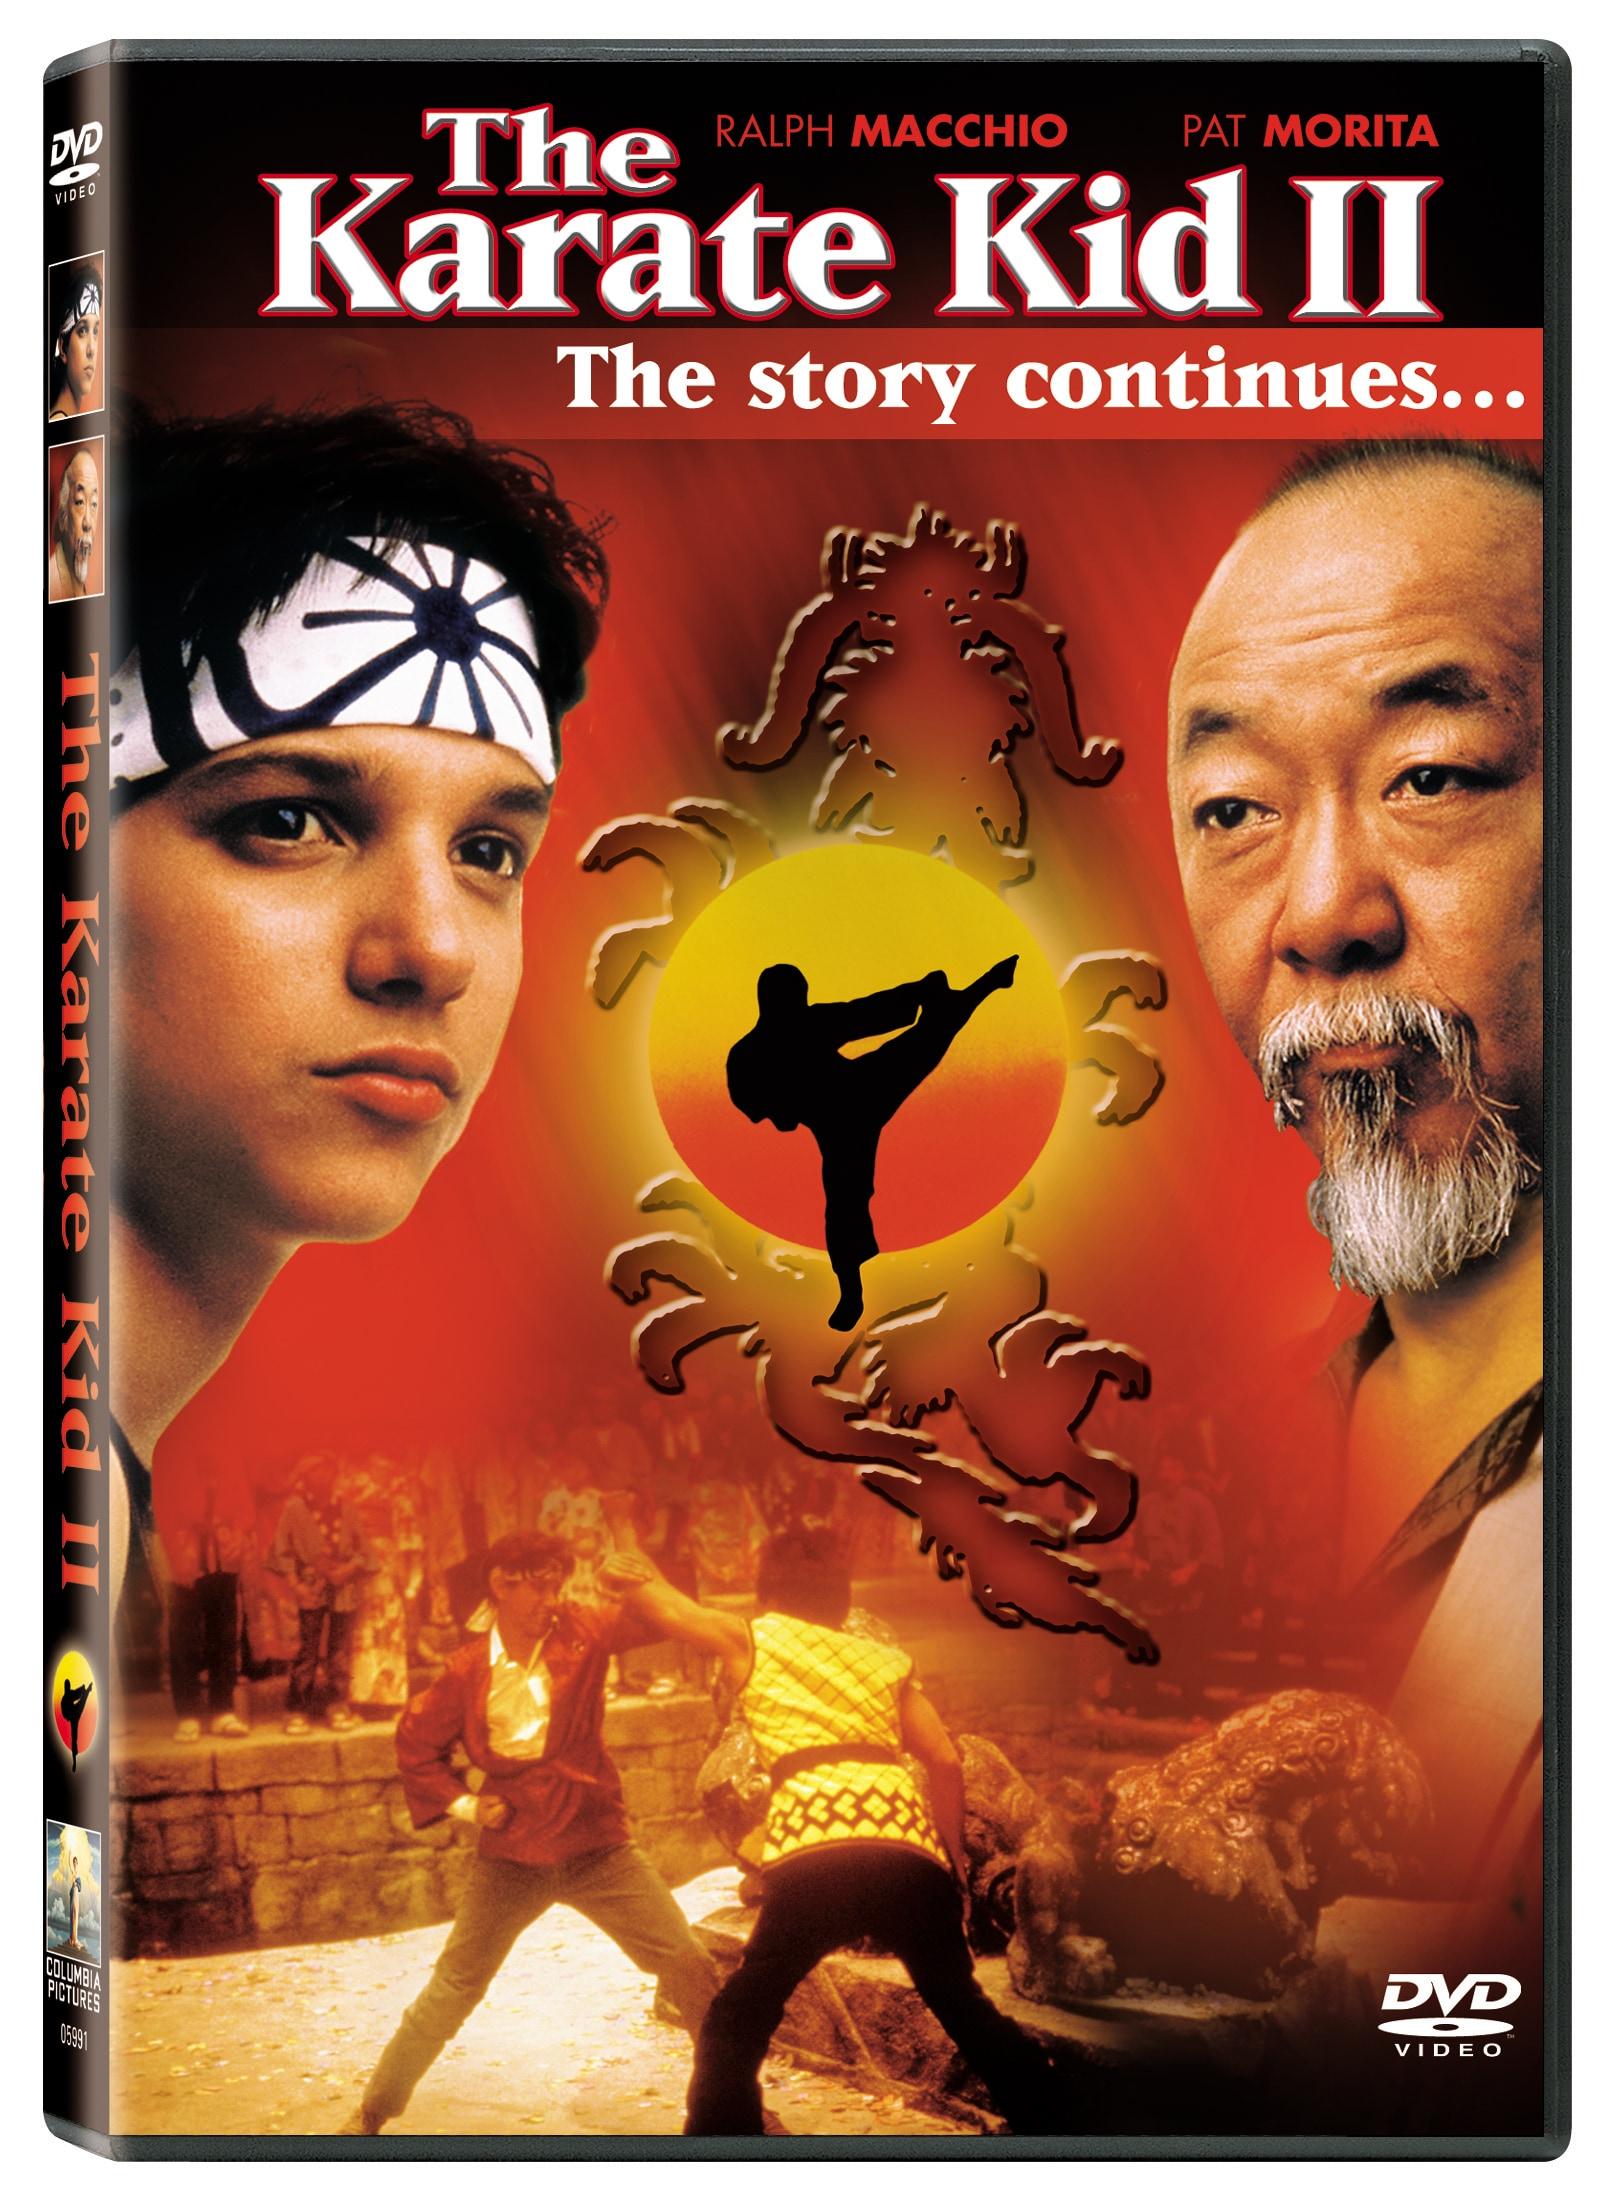 The Karate Kid 2 (DVD)